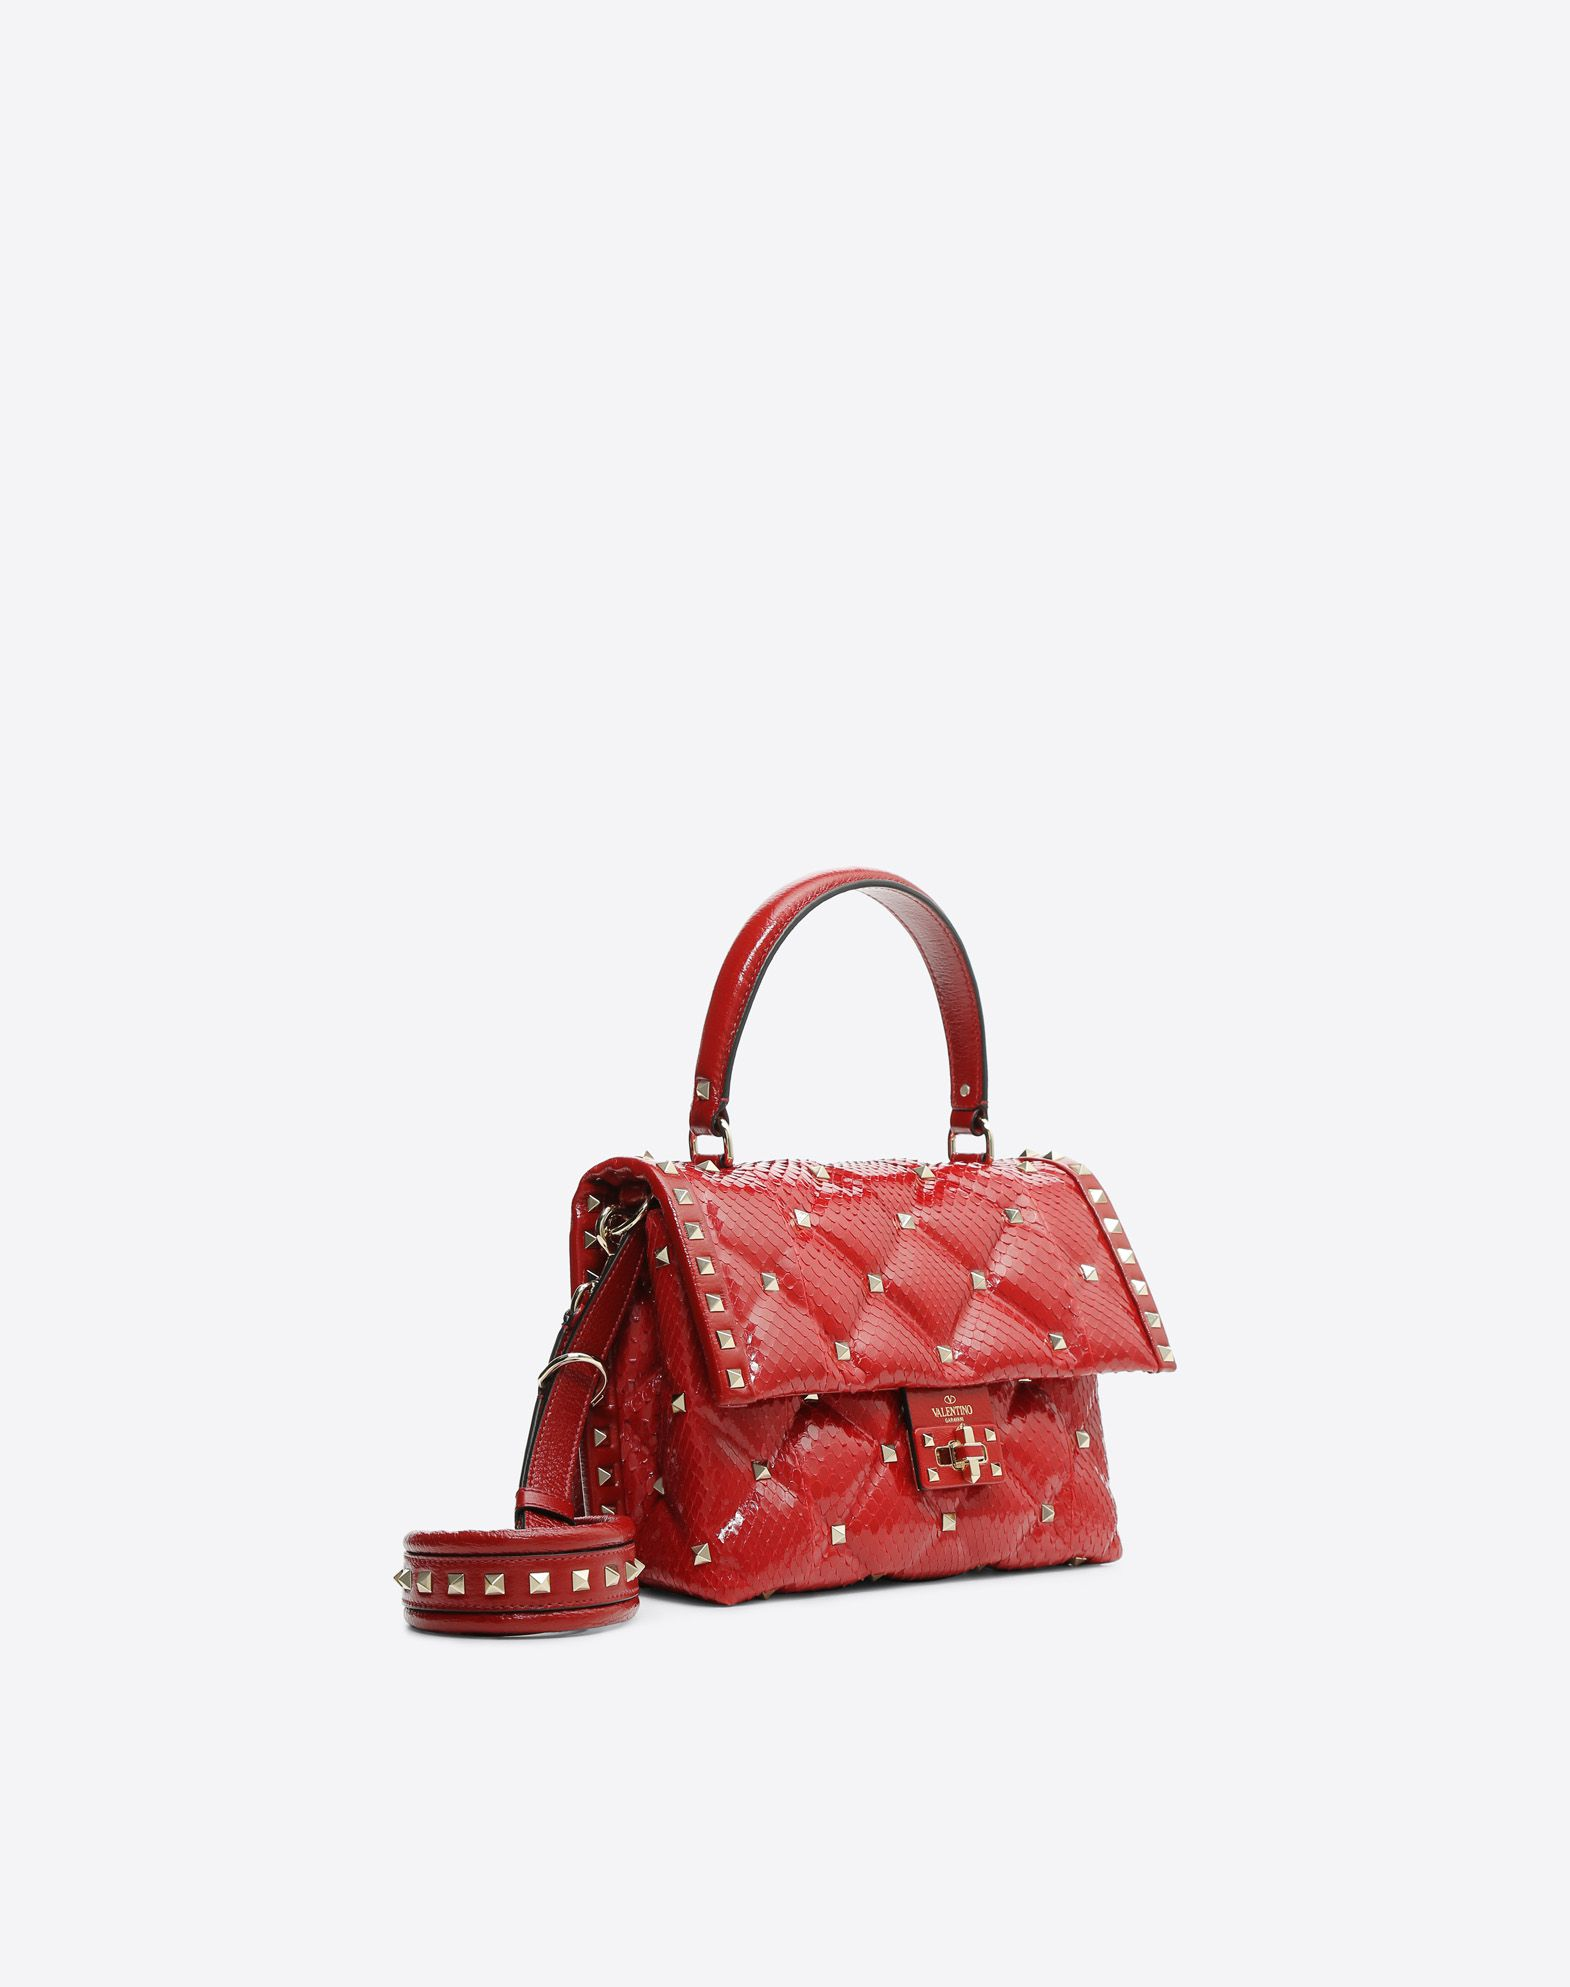 VALENTINO GARAVANI Candystud Top Handle Bag HANDBAG D r